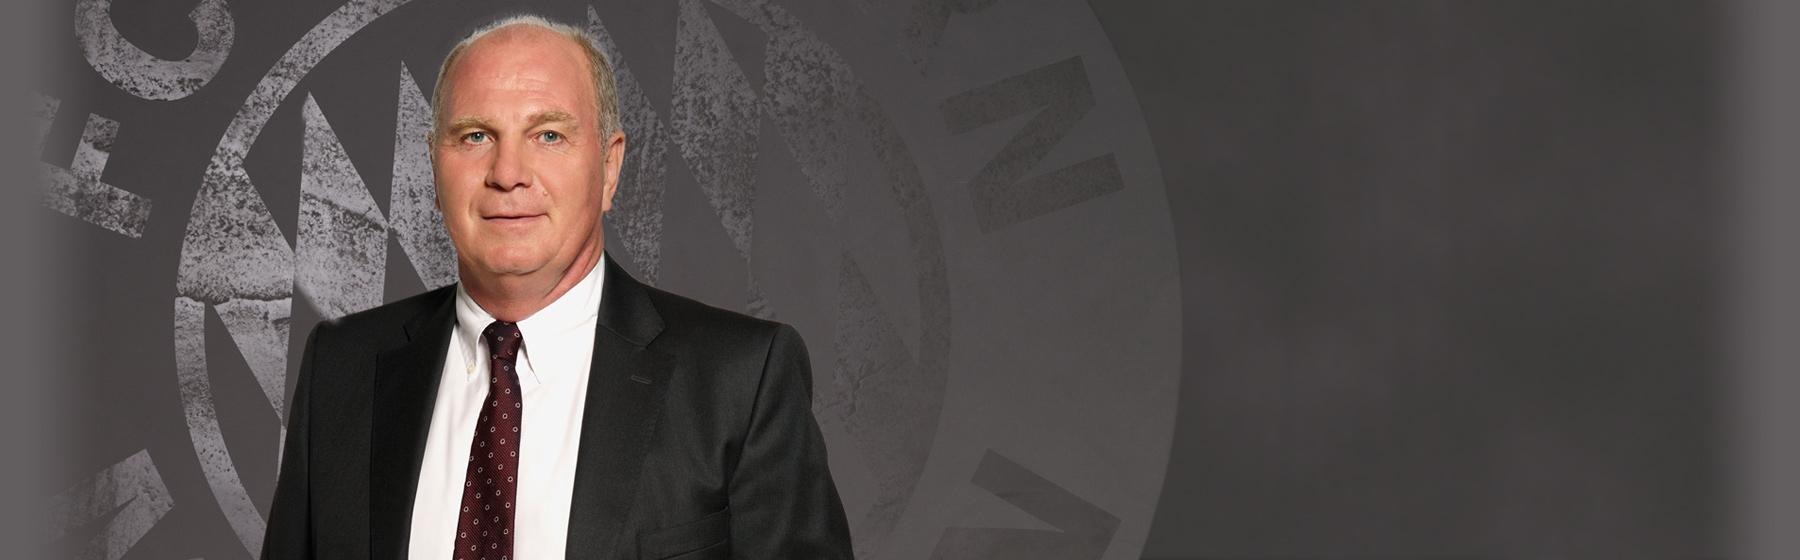 Uli Hoeneß FC Bayern Munich president header-picture